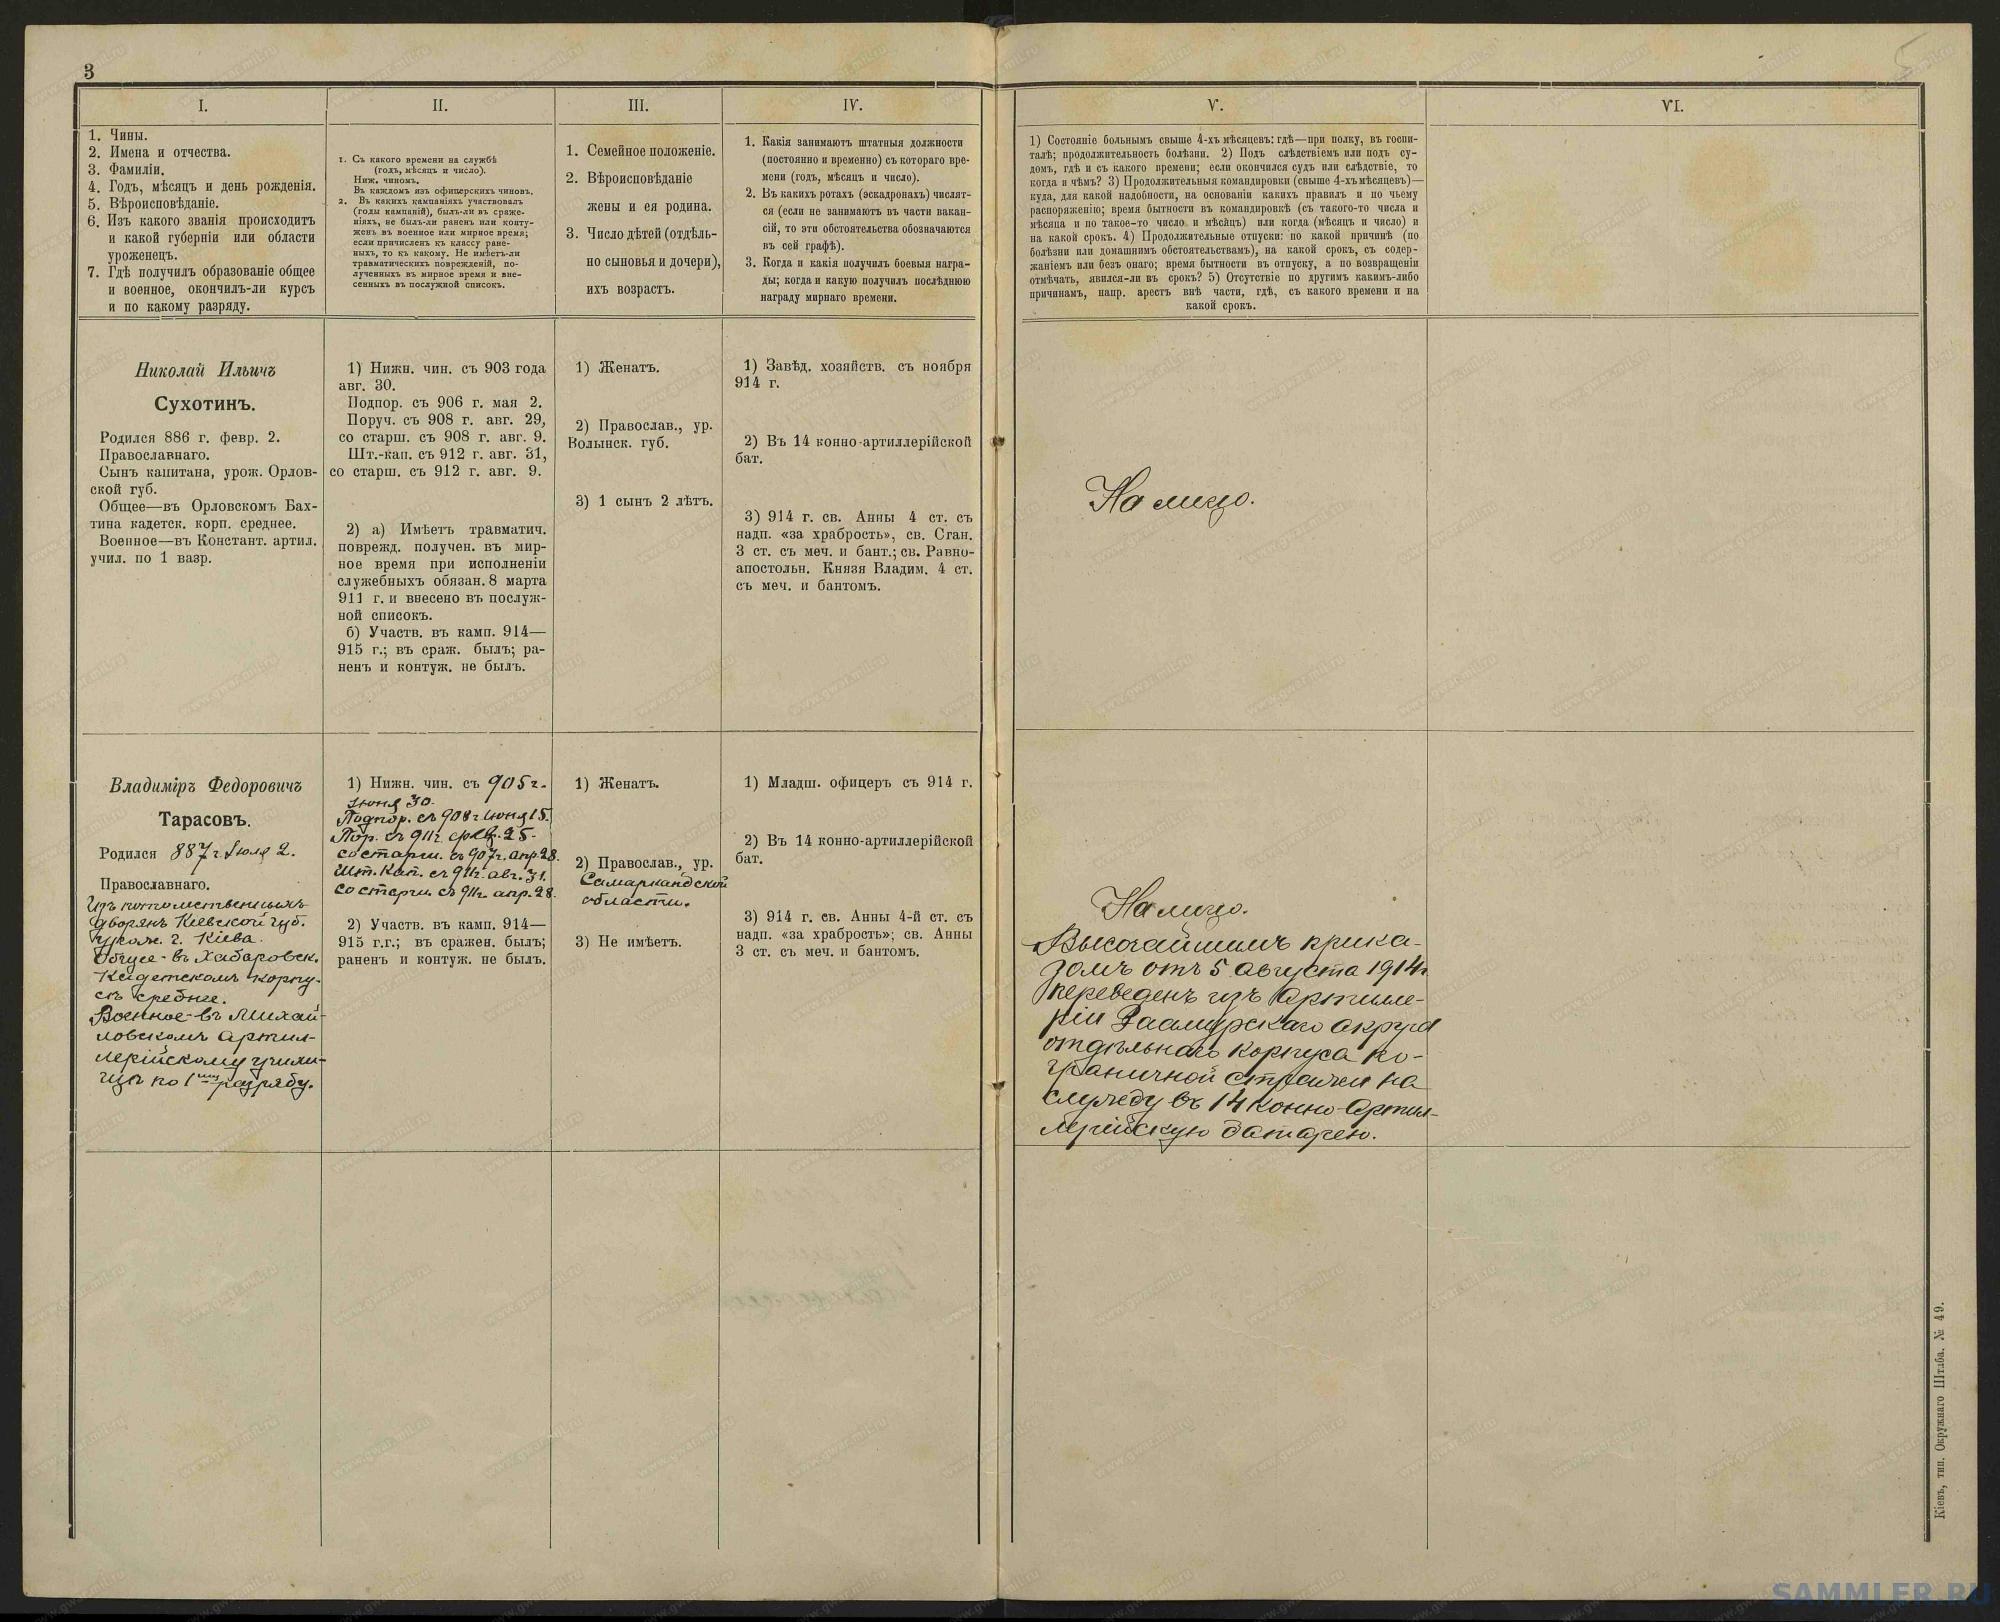 Список офицеров 7-го конно-артиллерийского дивизиона на 01.01.1915__06_.jpg